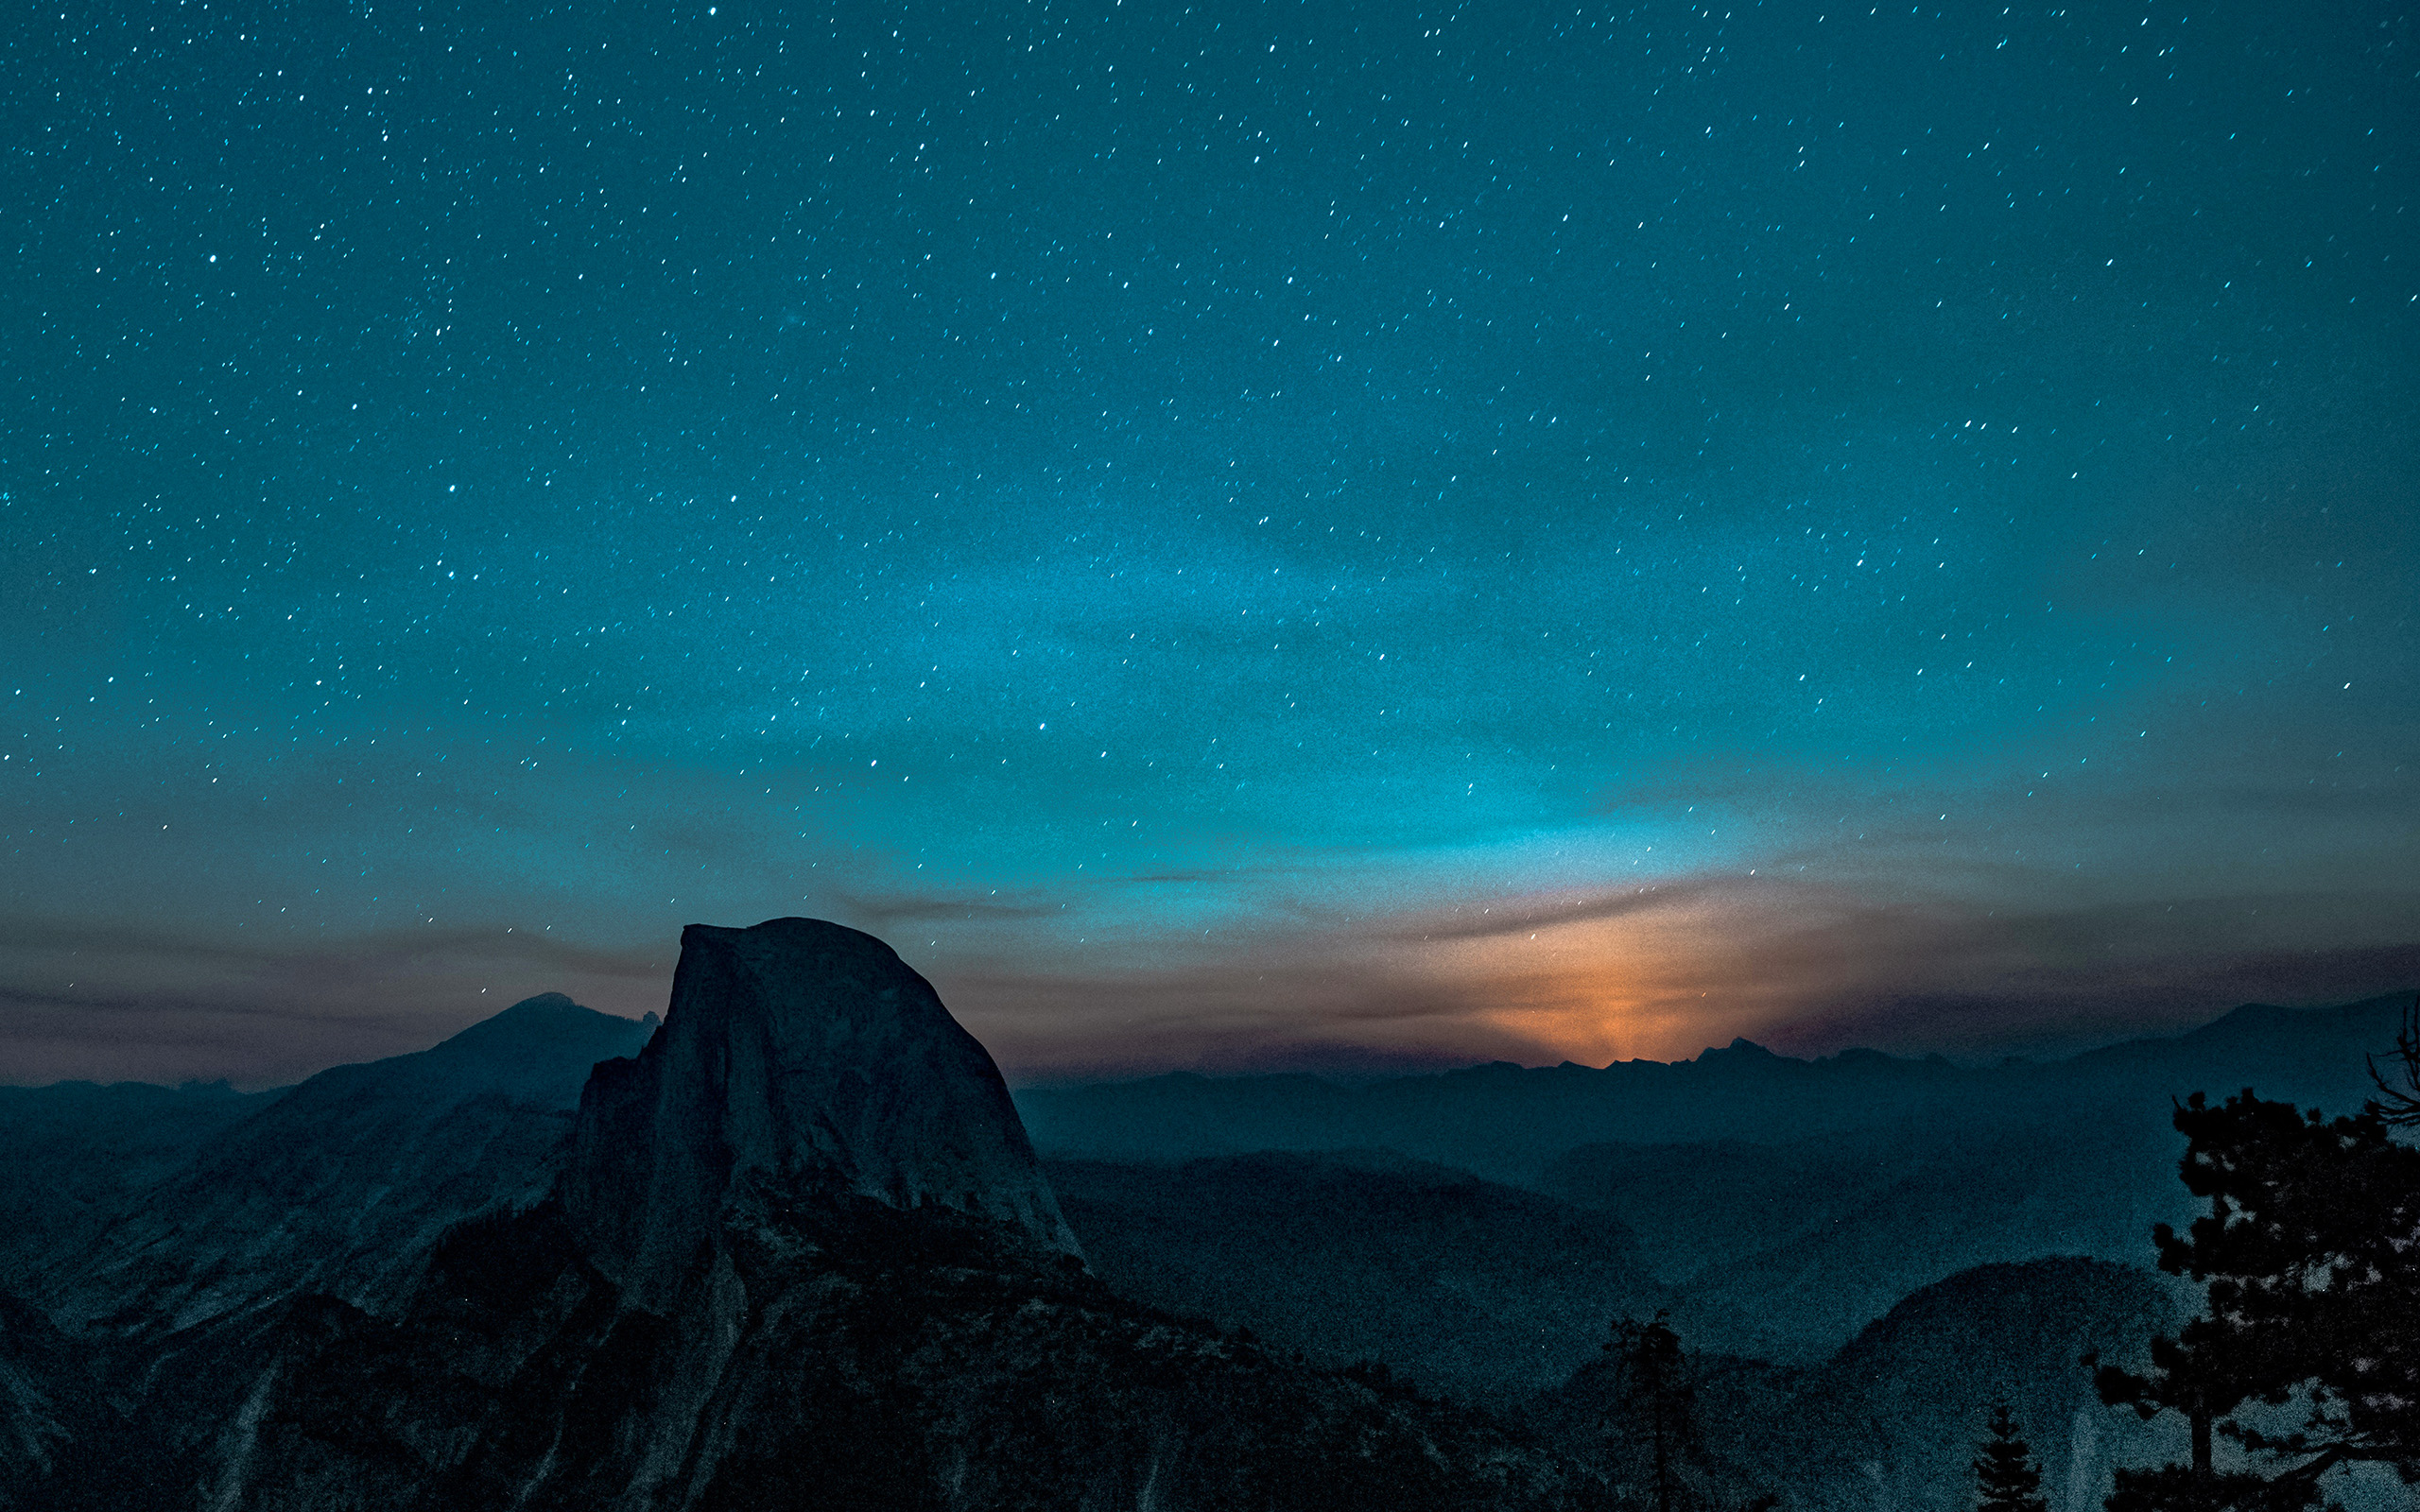 wallpaper for desktop, laptop   ns52-mountain-night-sky ...